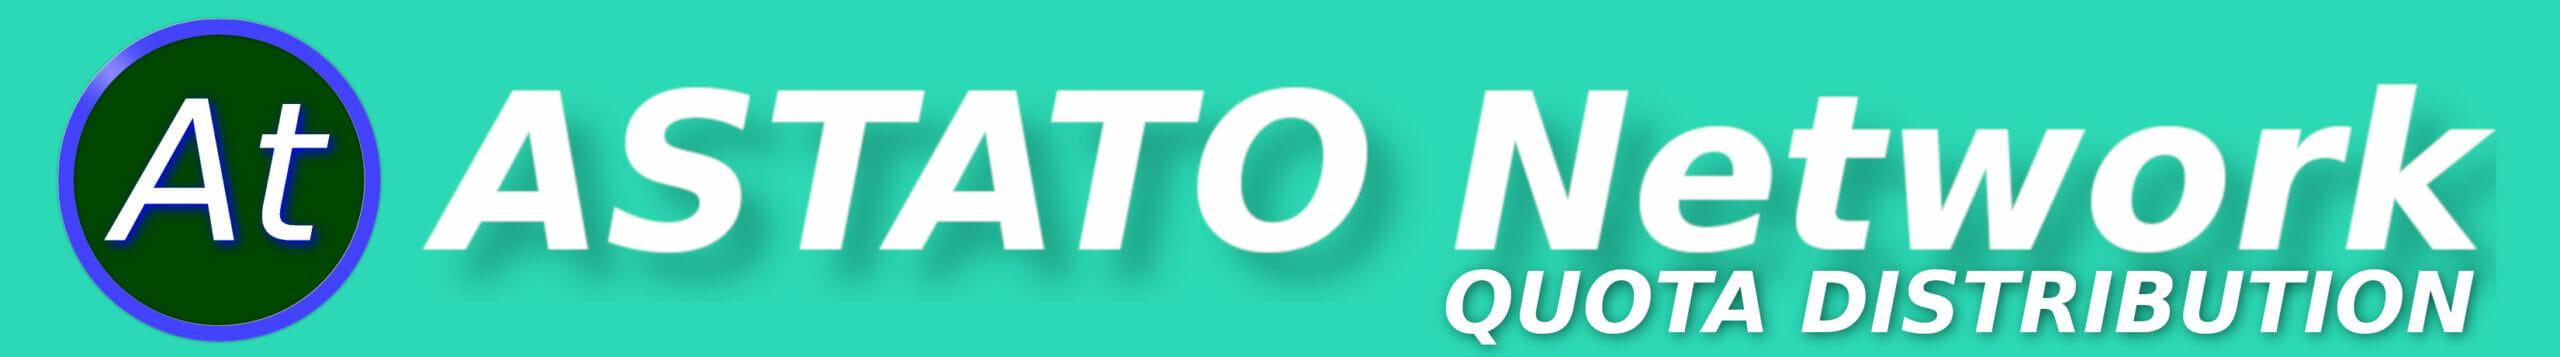 Gesponsertes ASTATO-Banner